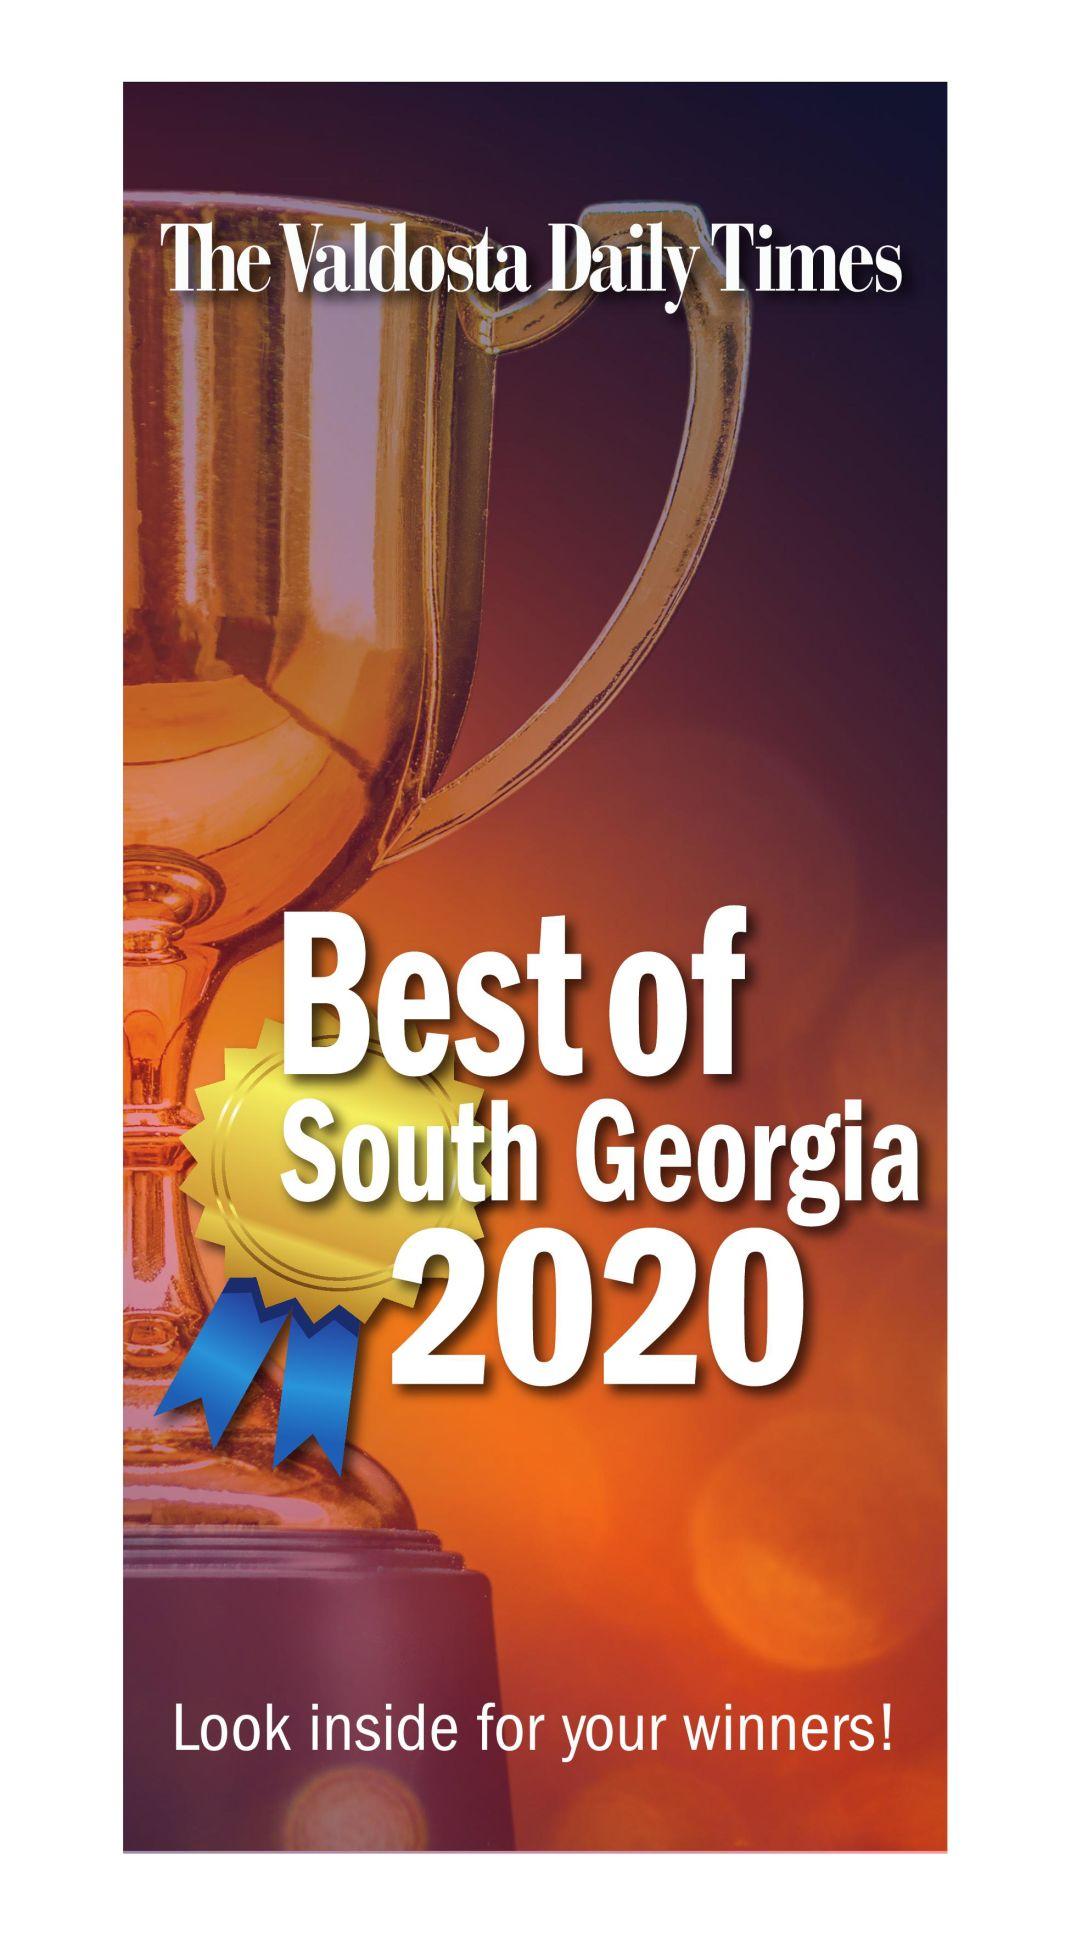 Best of South Georgia 2020